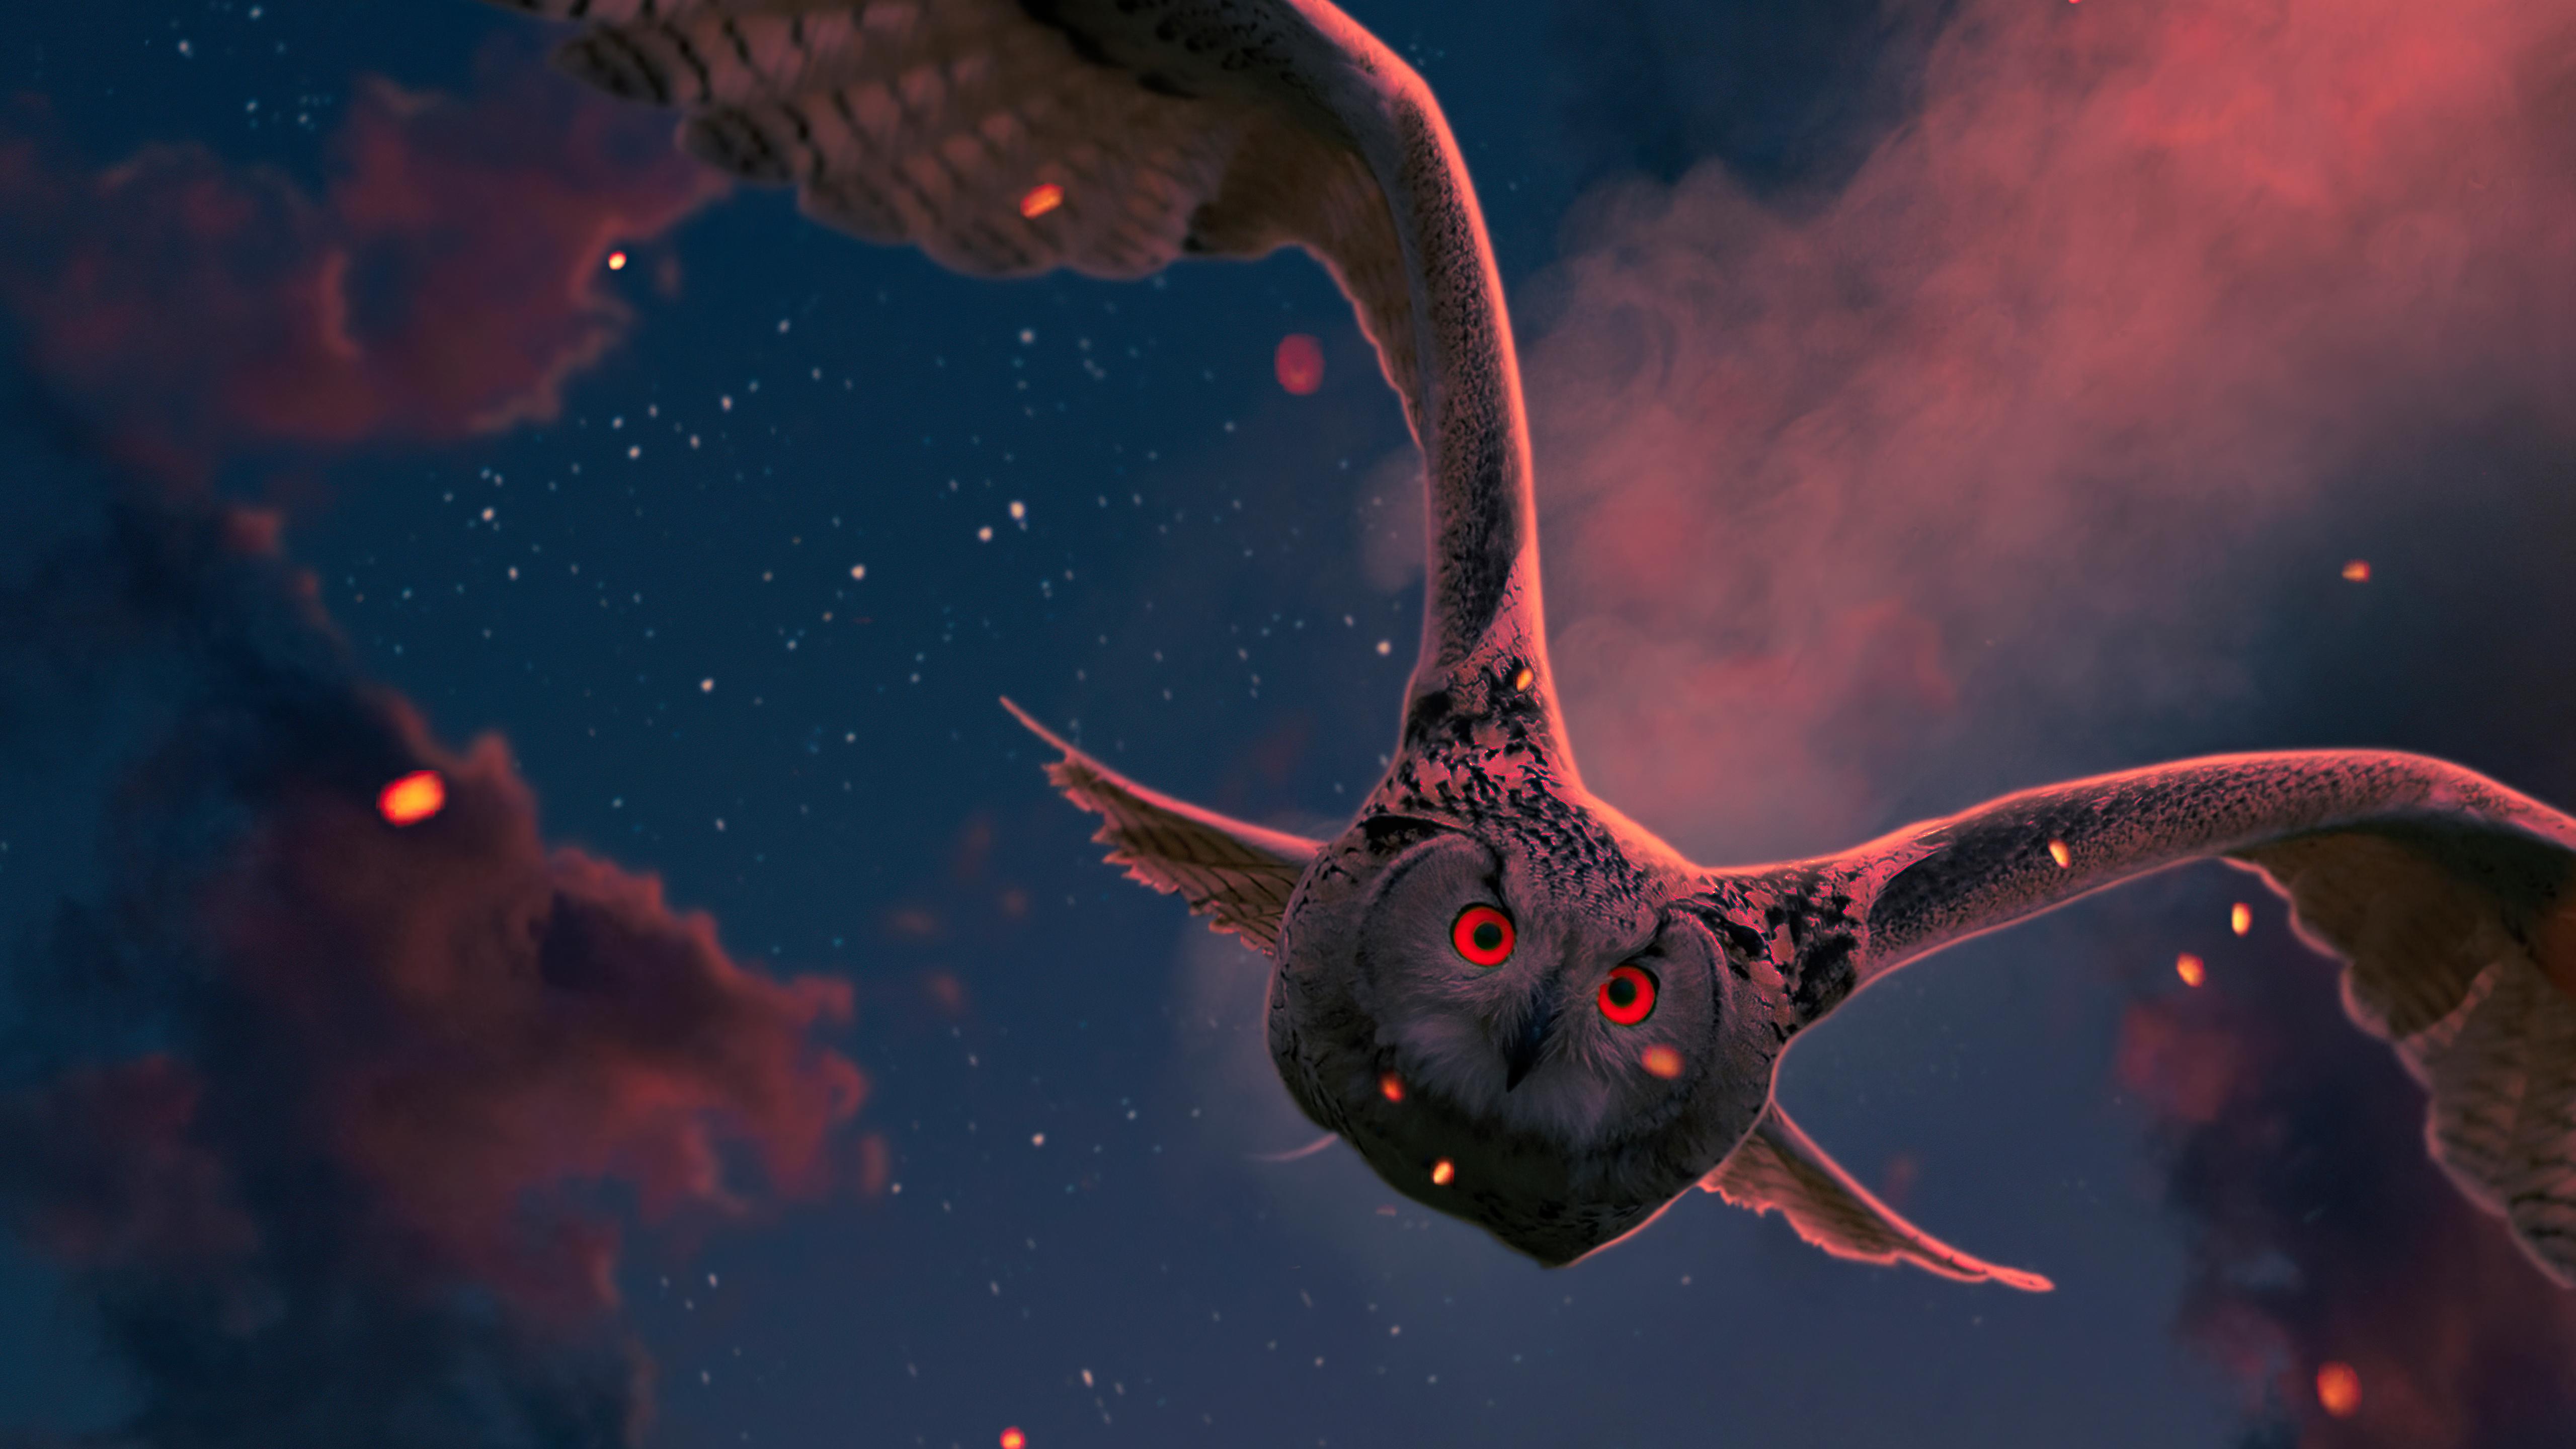 owl-red-eyes-5k-mf.jpg